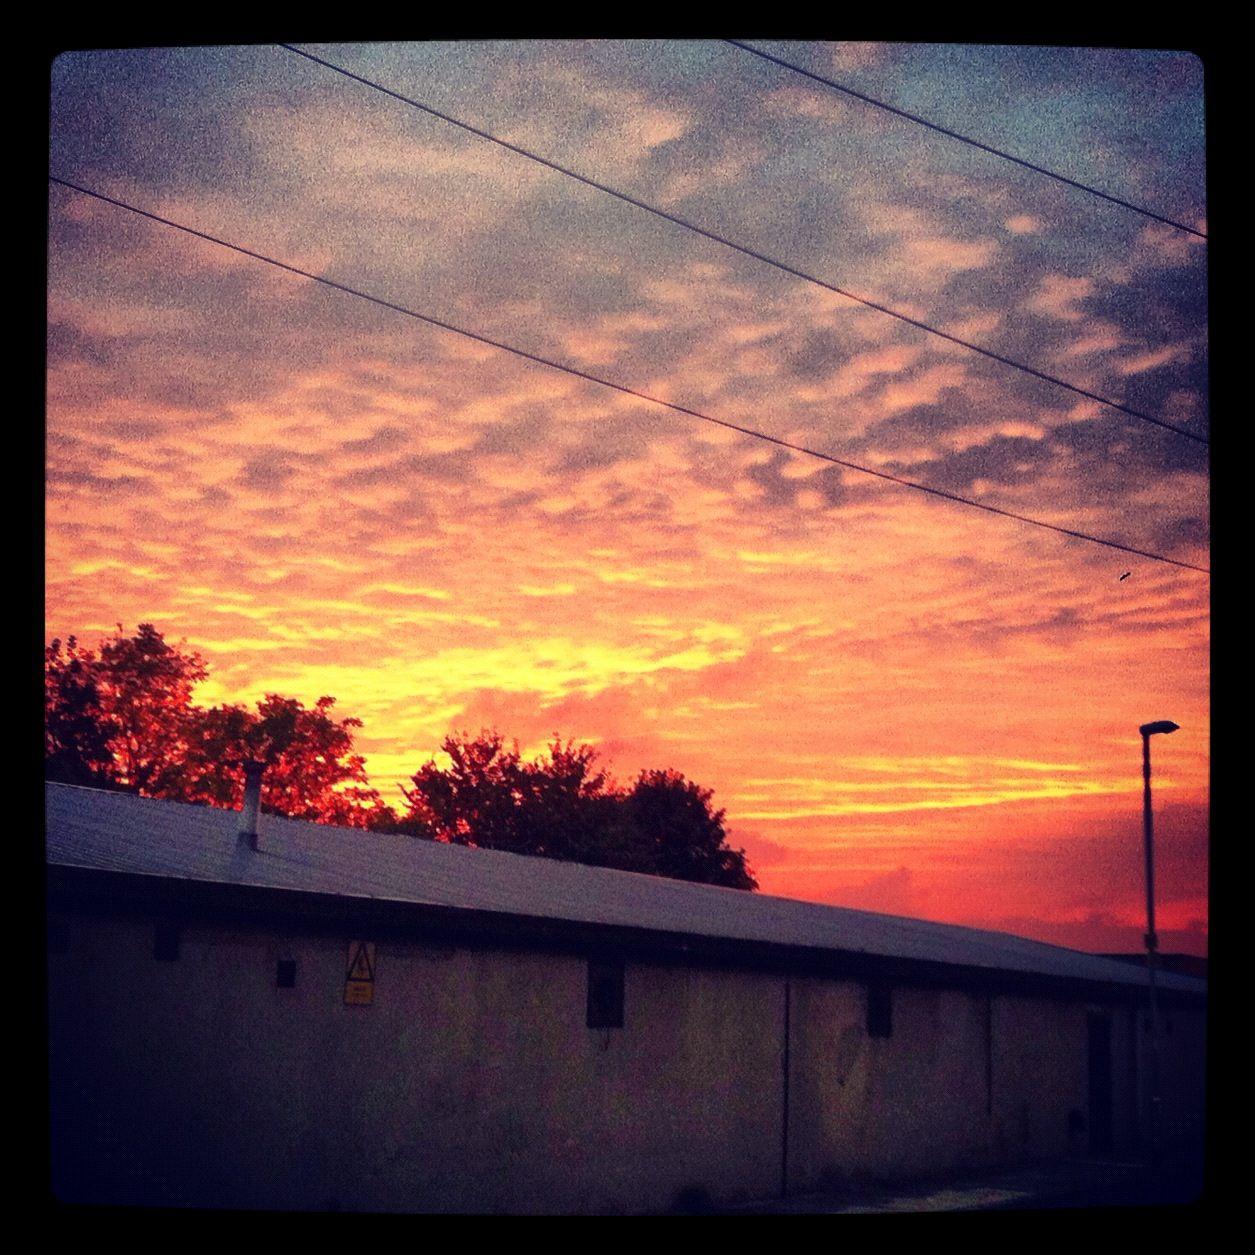 Firey skies in my ghetto x